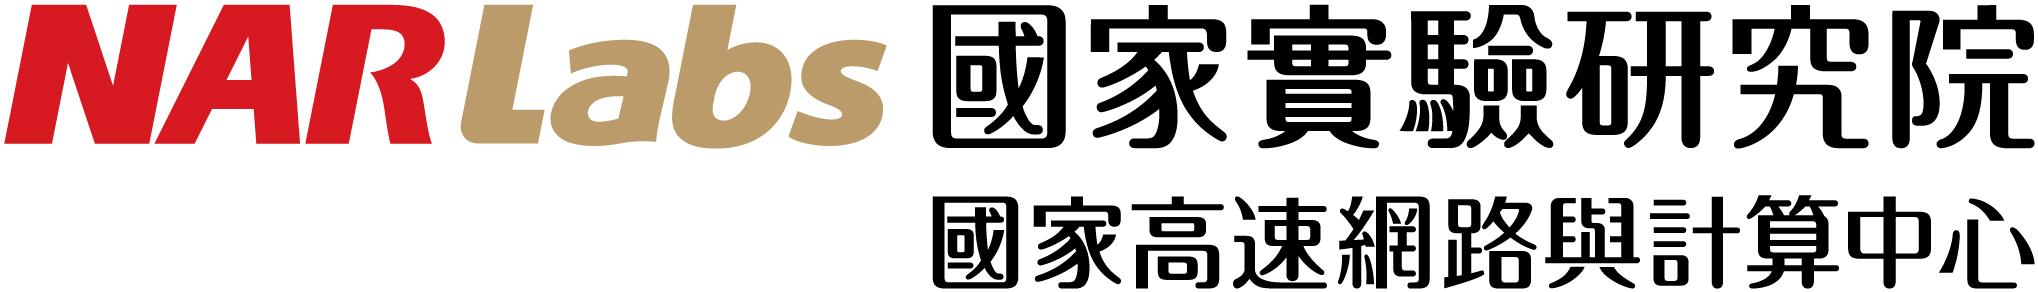 nchc_logo